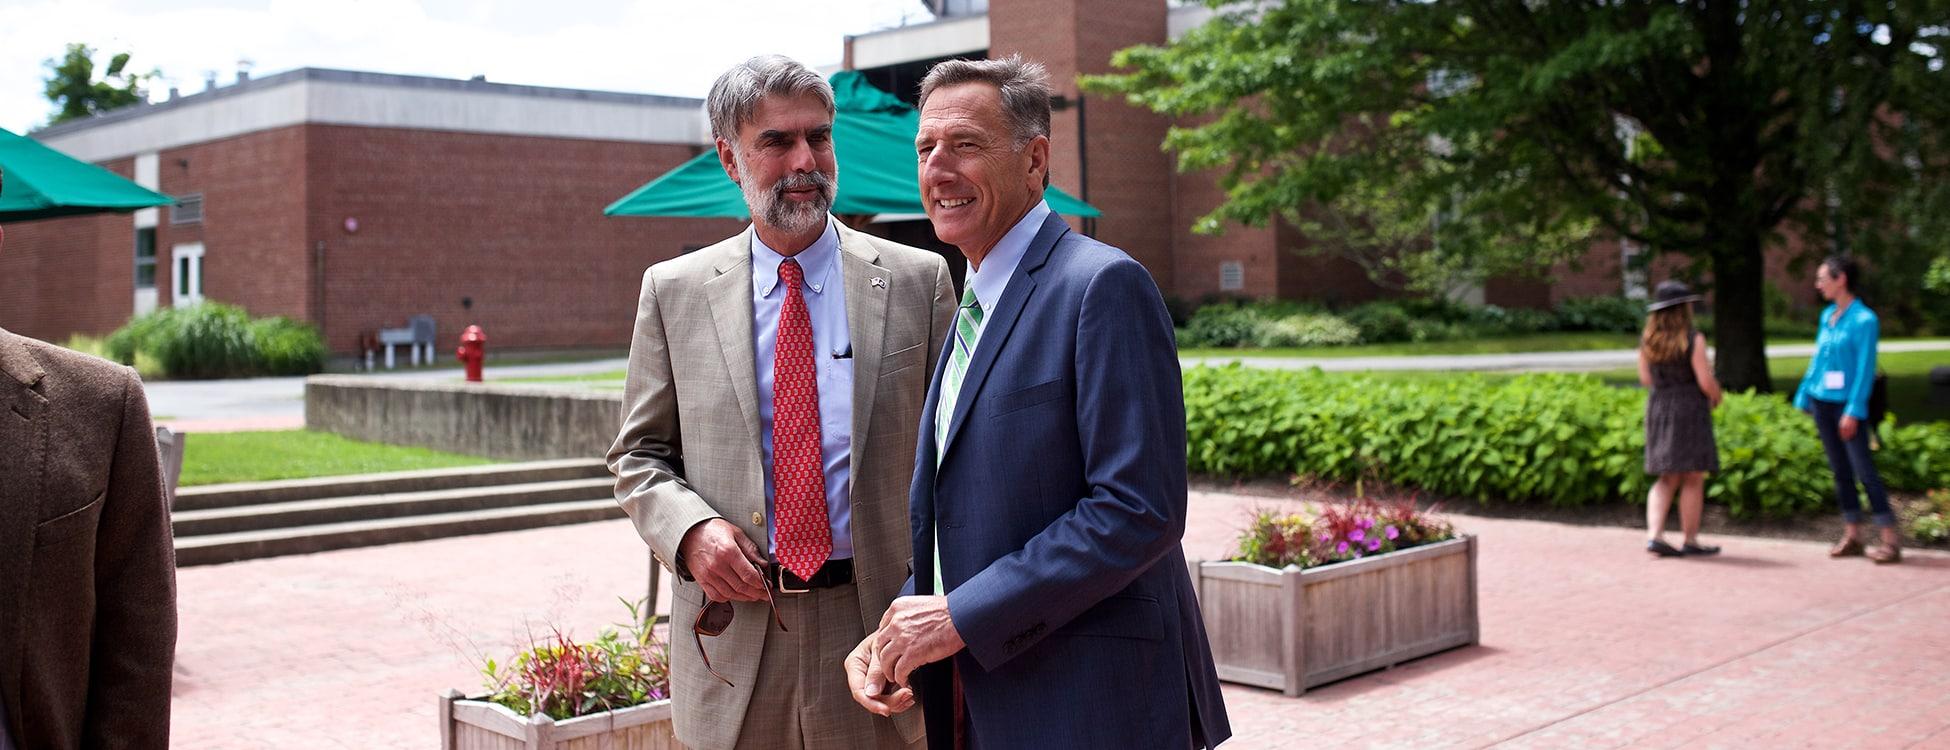 Governor Peter Shumlin, Vermont Tech, Randolph Center campus, outside